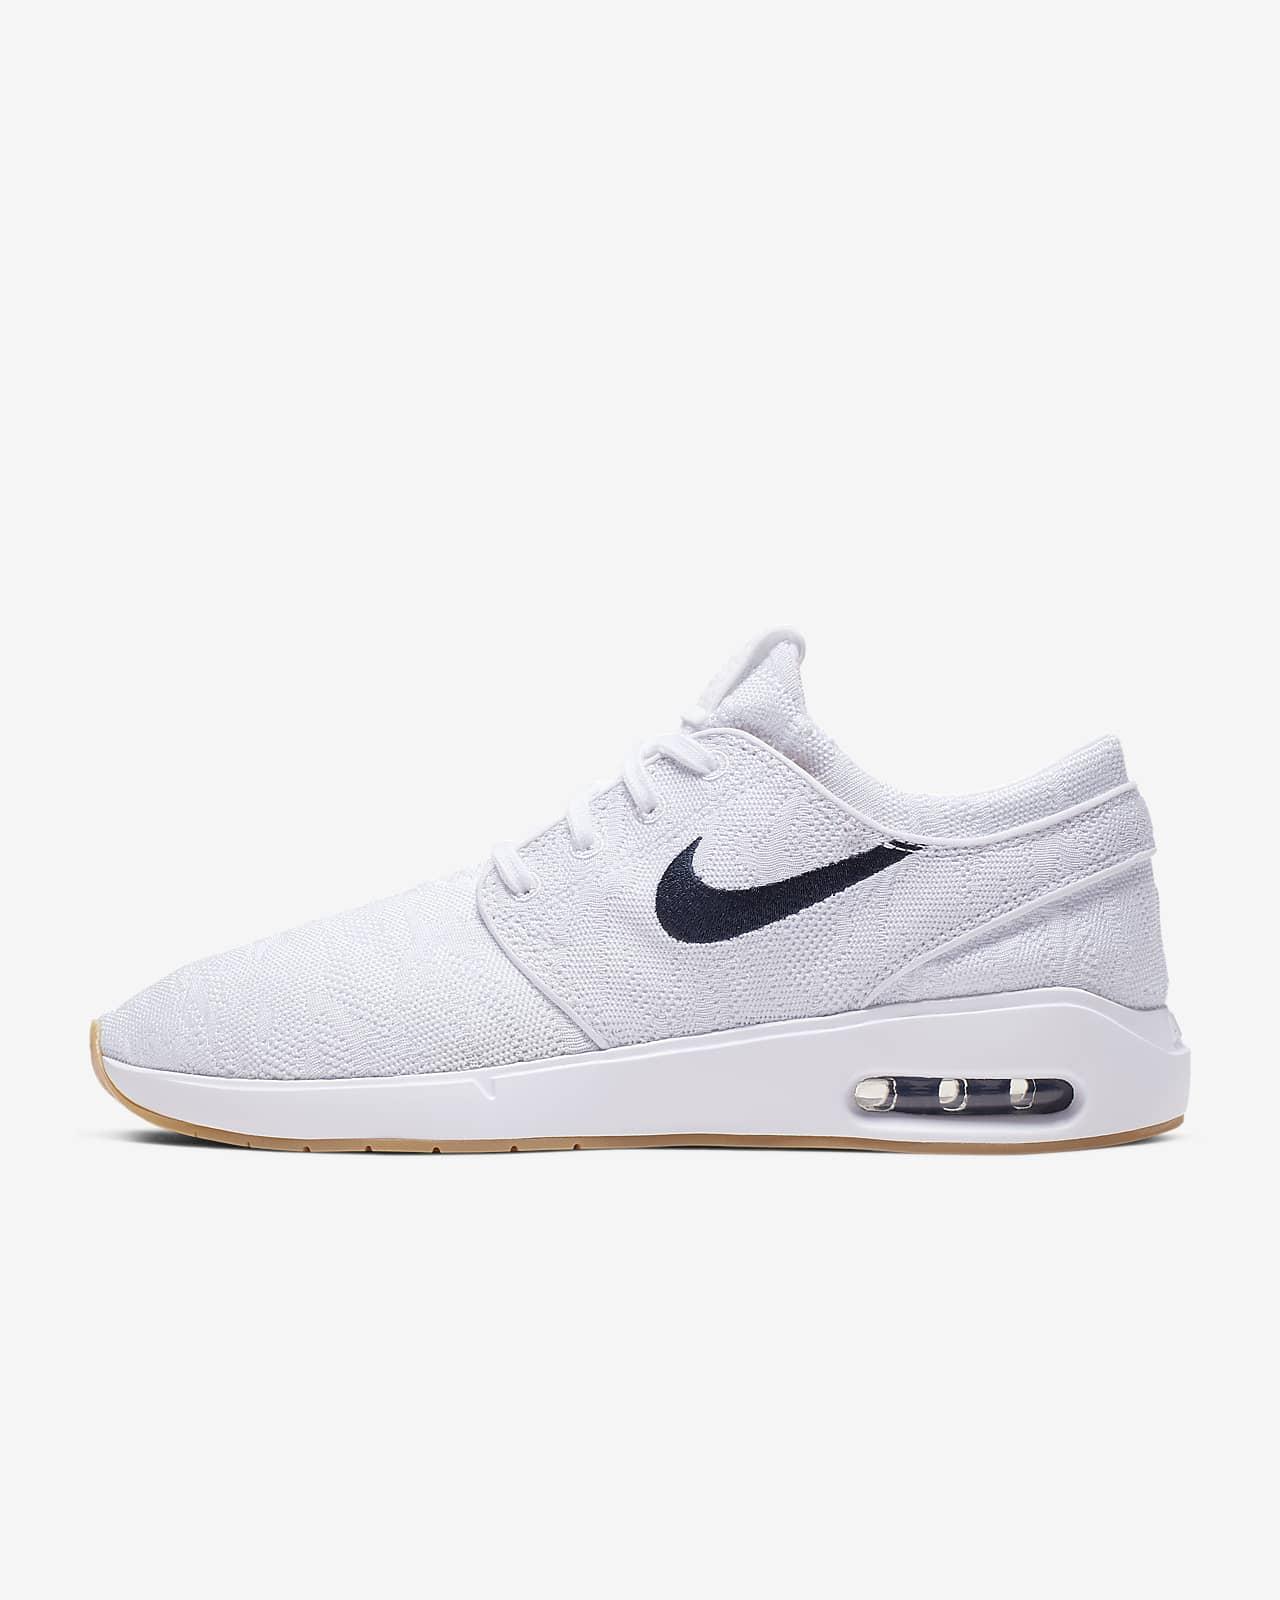 Mencionar Rústico Parámetros  Calzado de skateboarding Nike SB Air Max Stefan Janoski 2. Nike CL